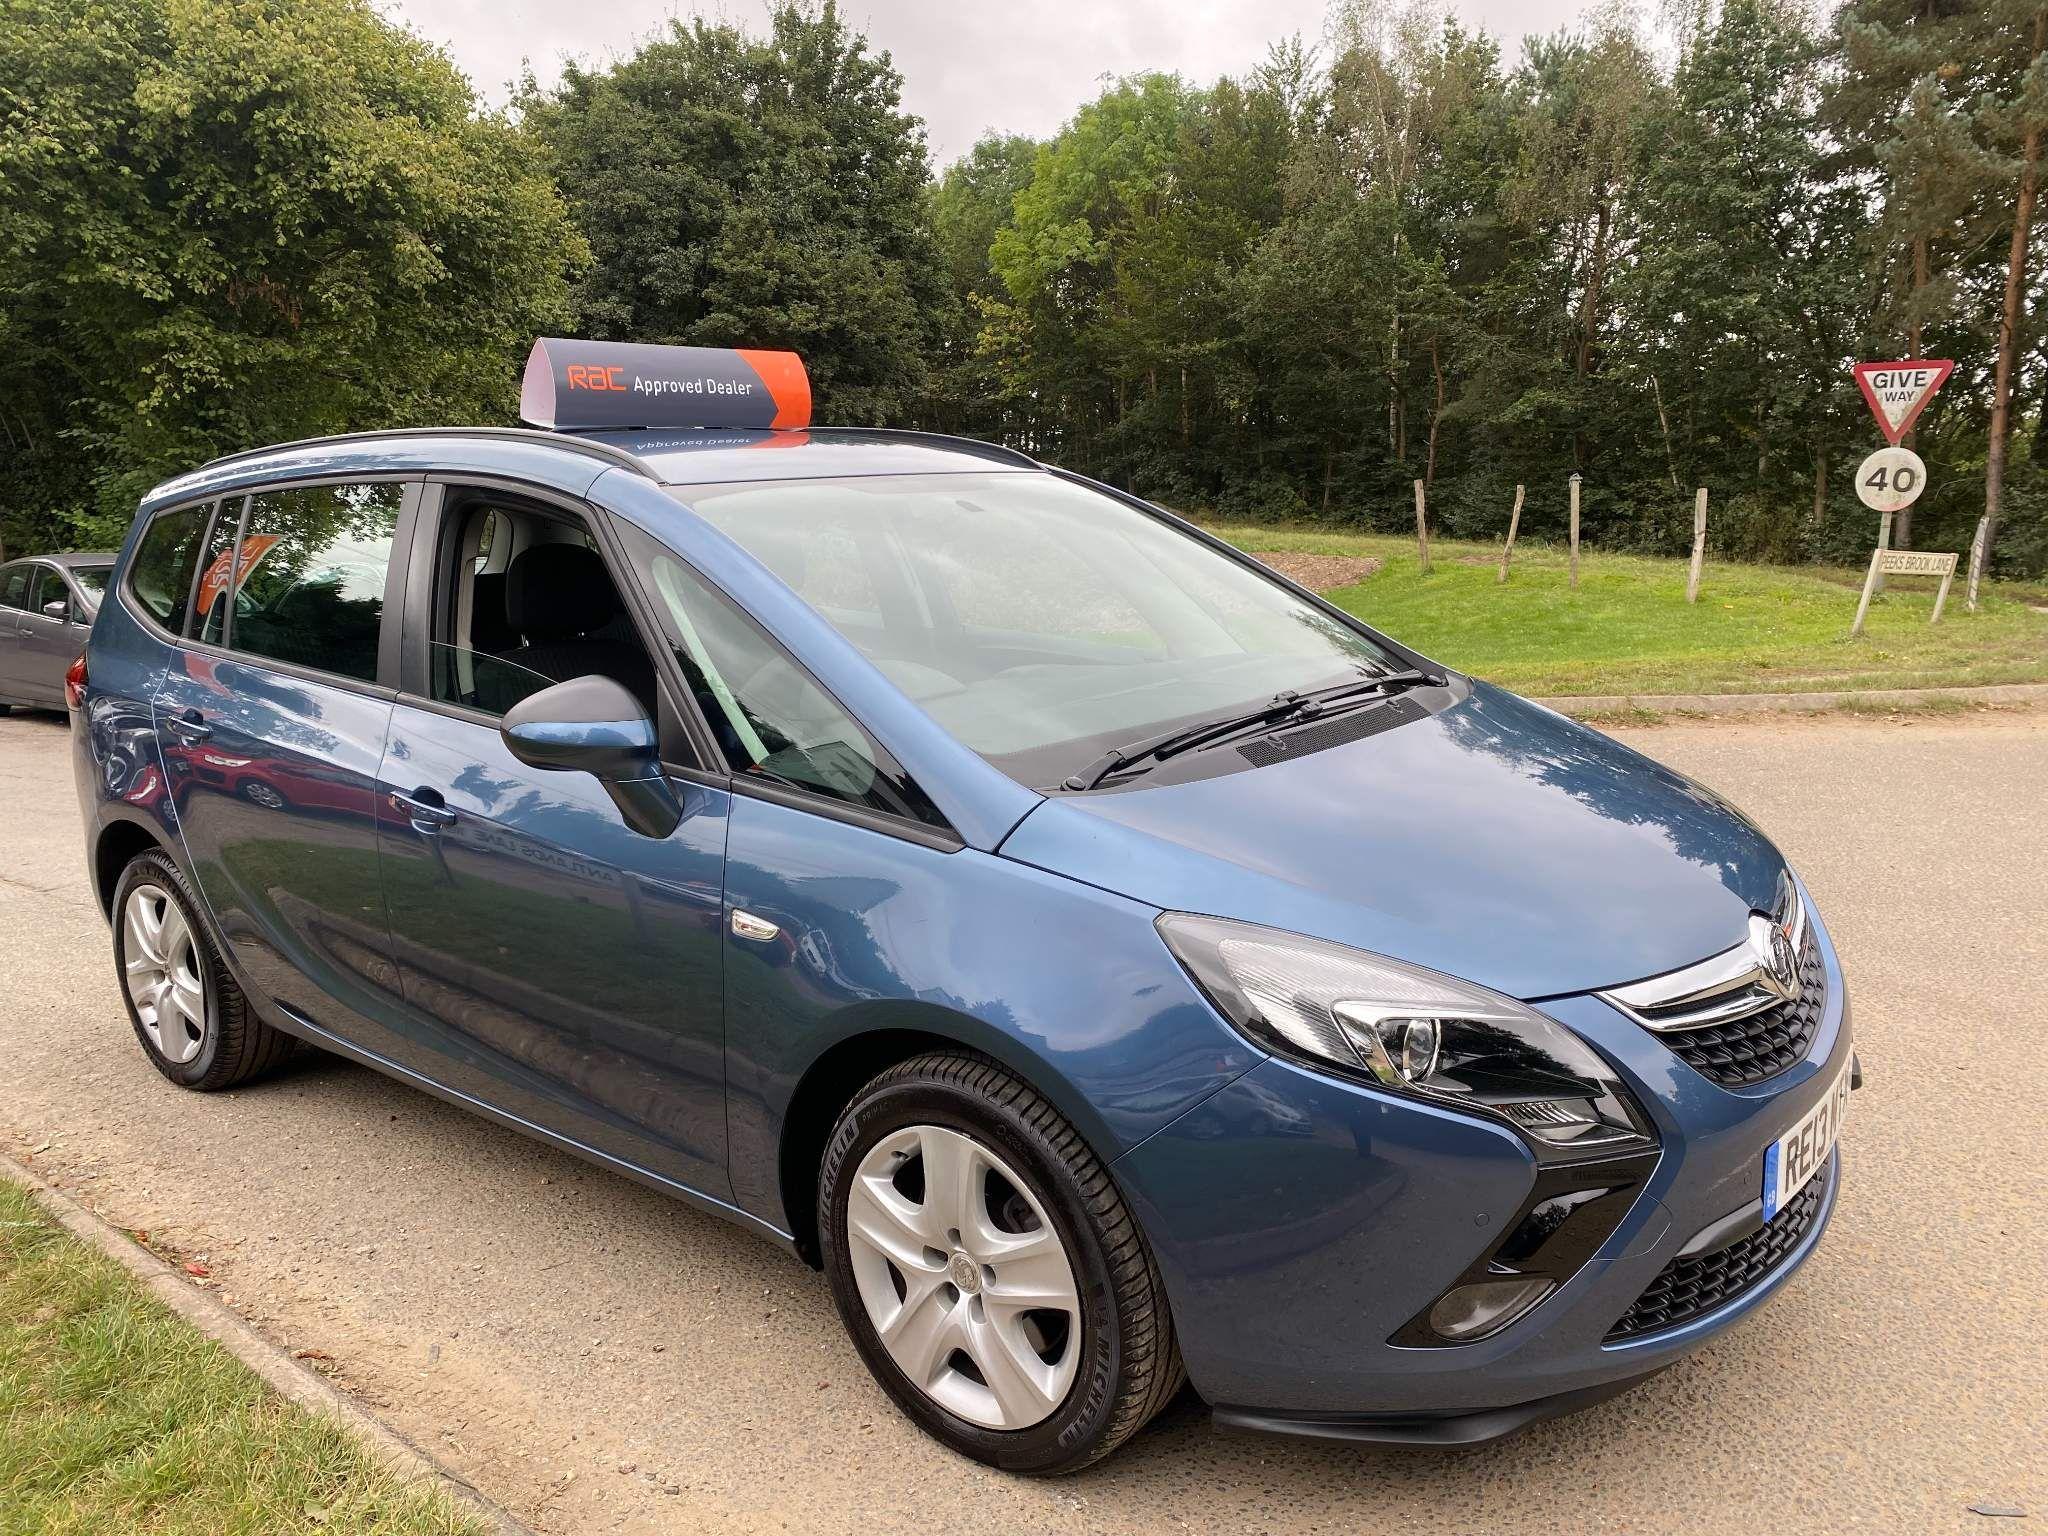 Used Vauxhall Zafira Tourer for sale